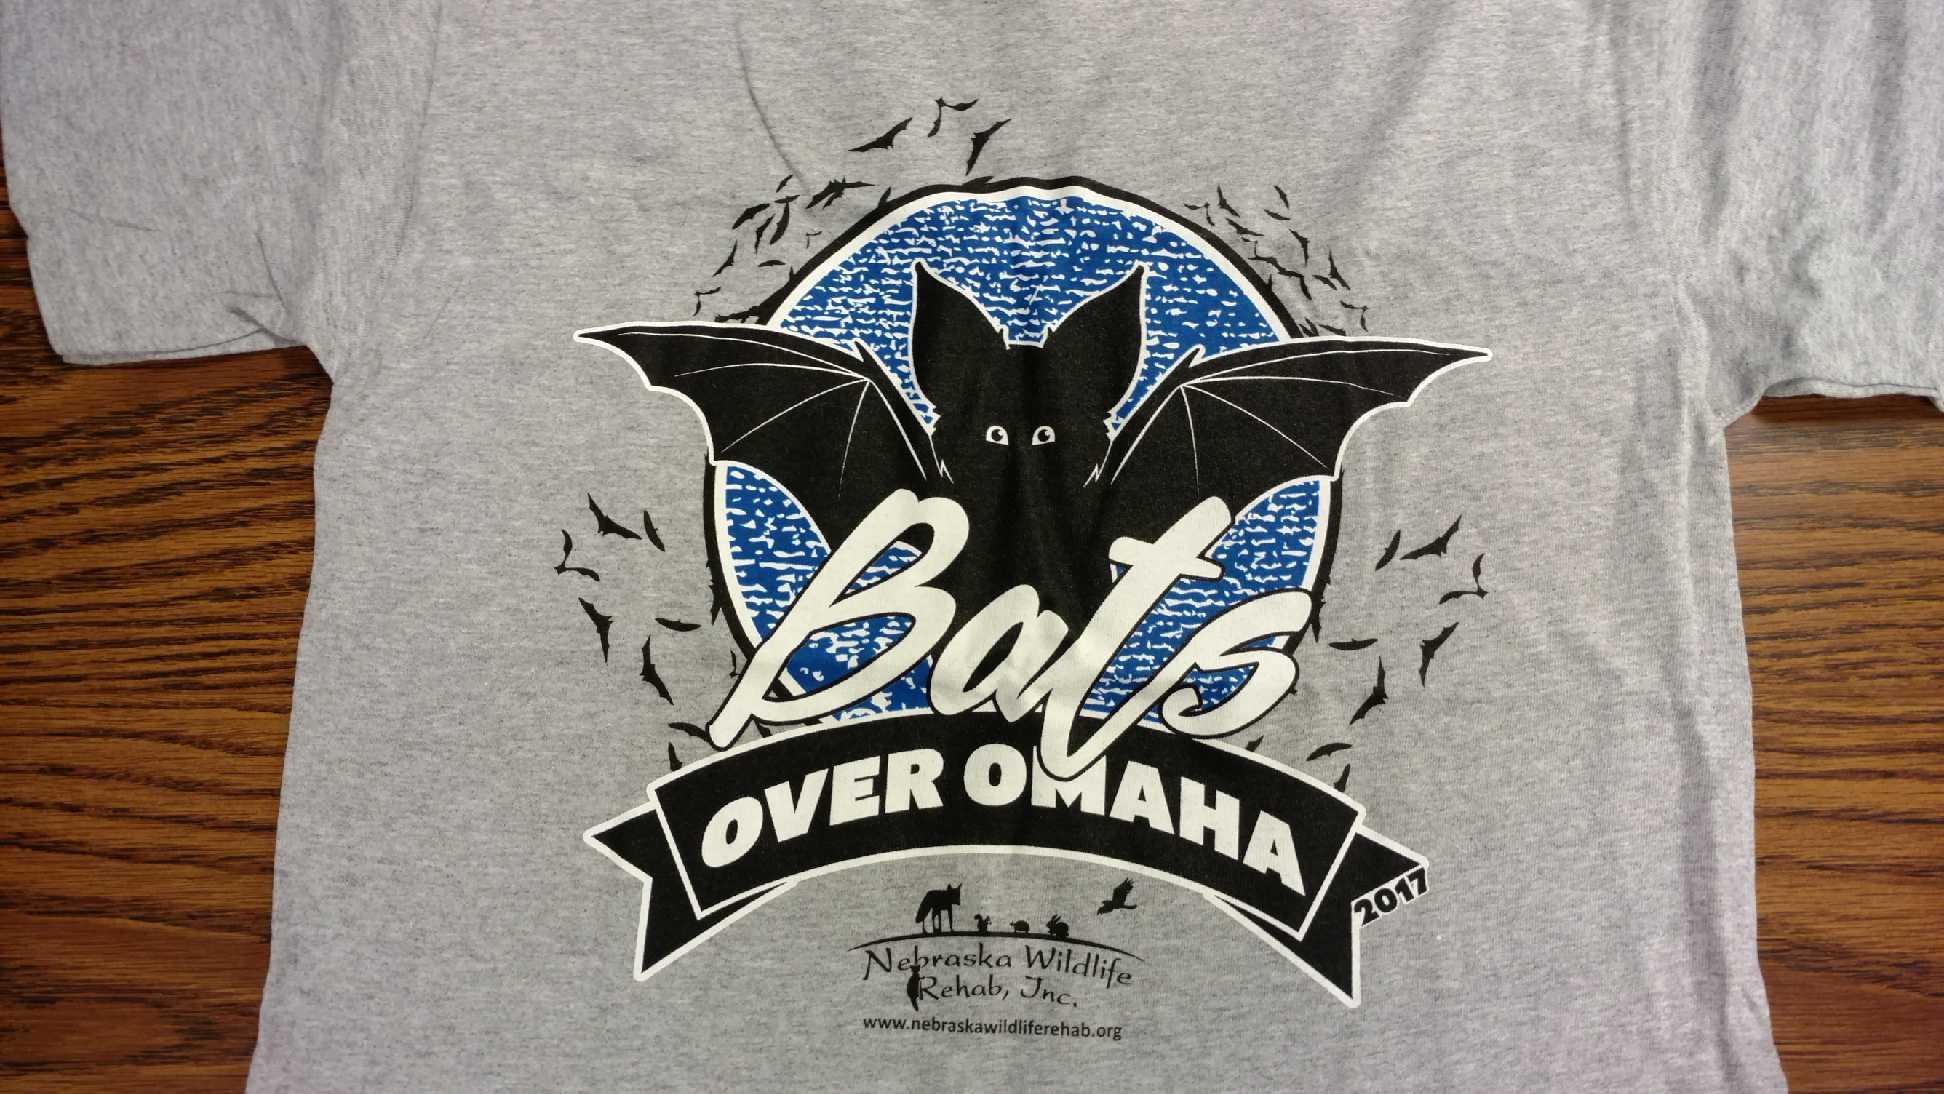 Bats Over Omaha Bat Release T-Shirt - 2017: Adult Large, Gray